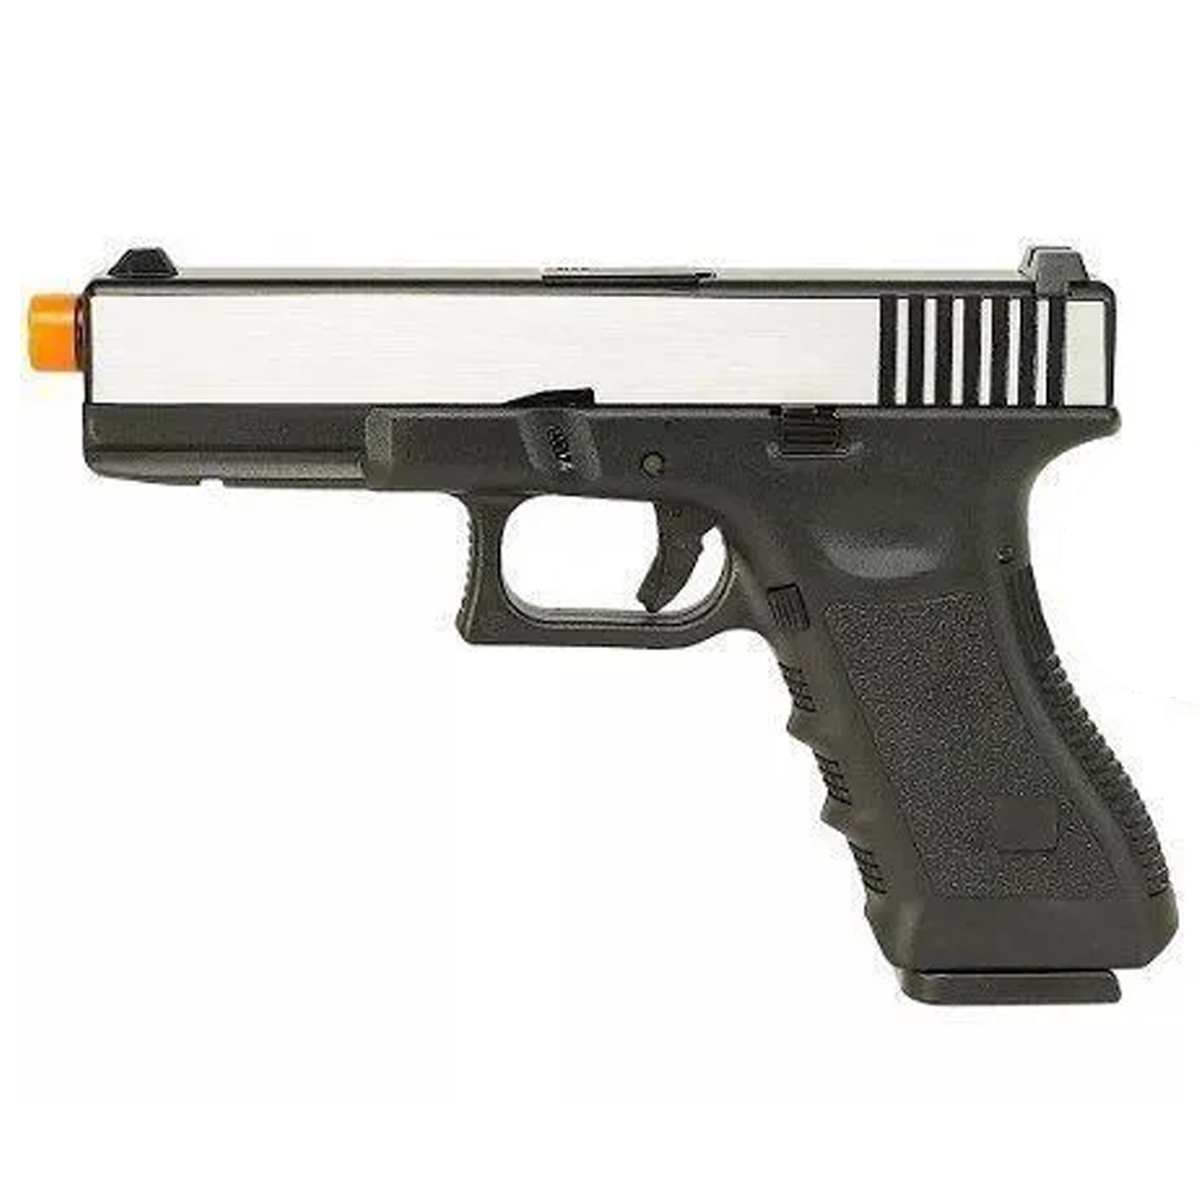 Pistola Airsfot Glock R17 Gbb Army Black/silver Mostruário